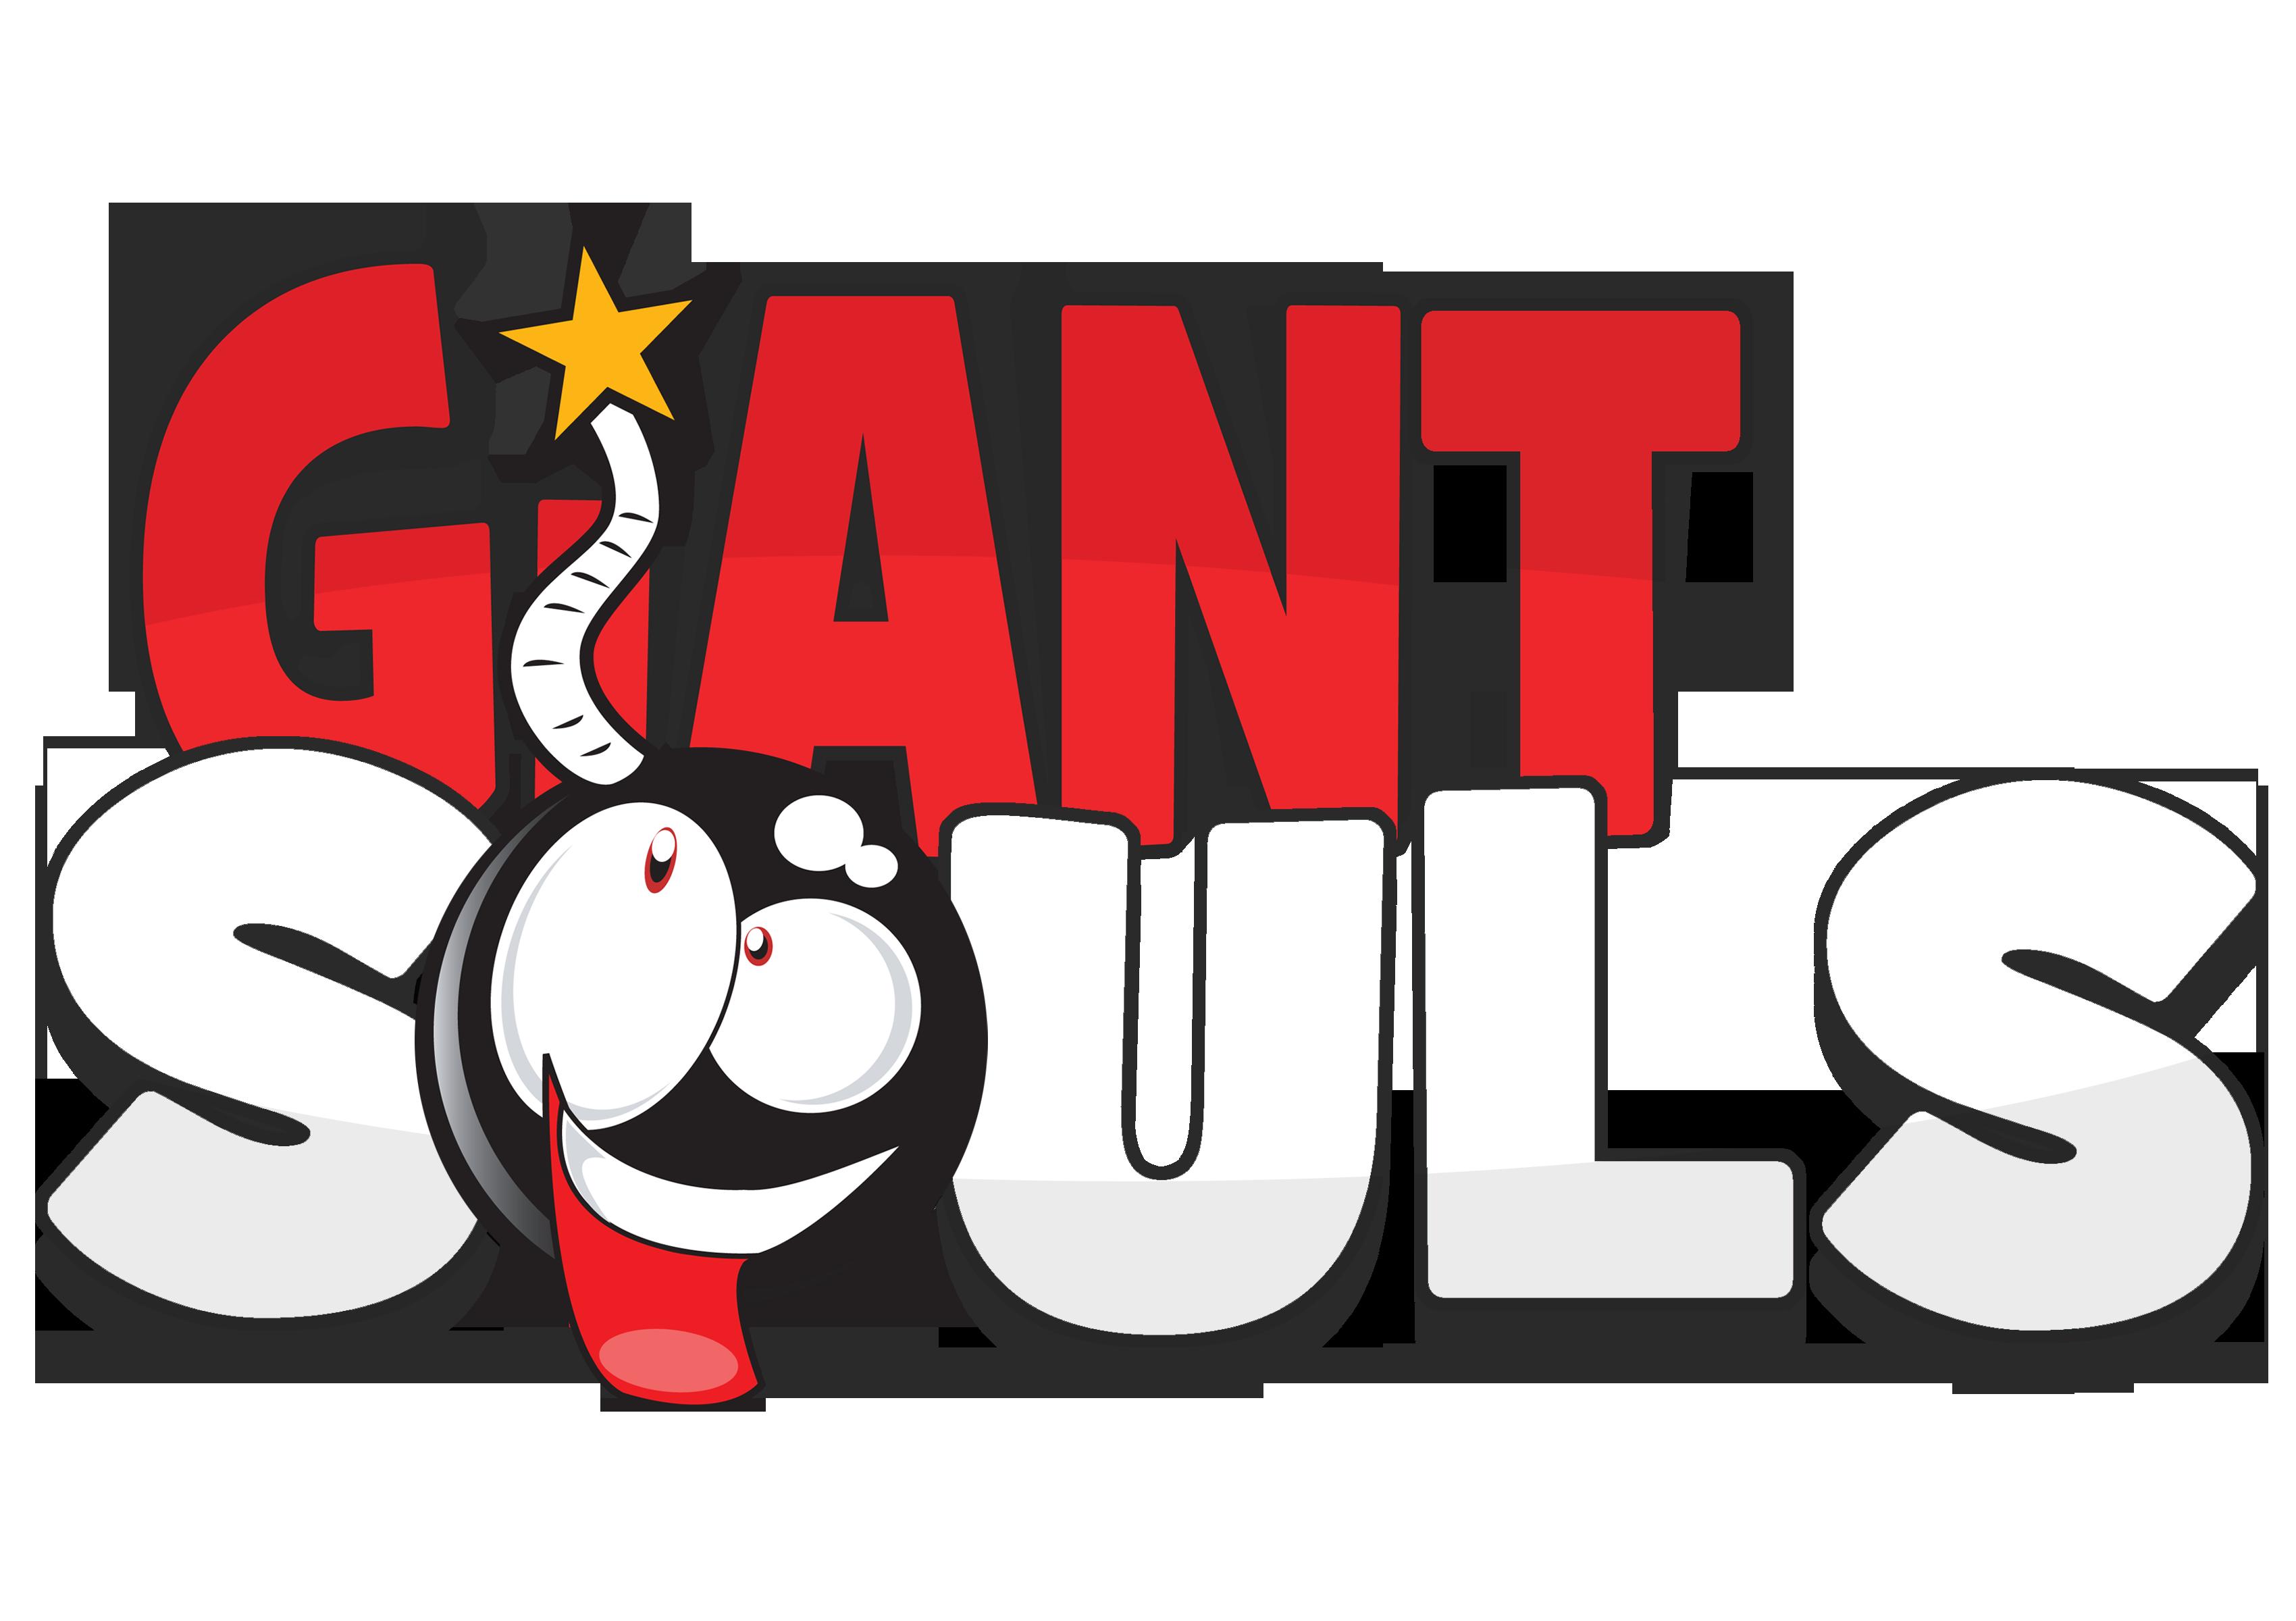 Youtube clipart dark souls. New giant bomb logo